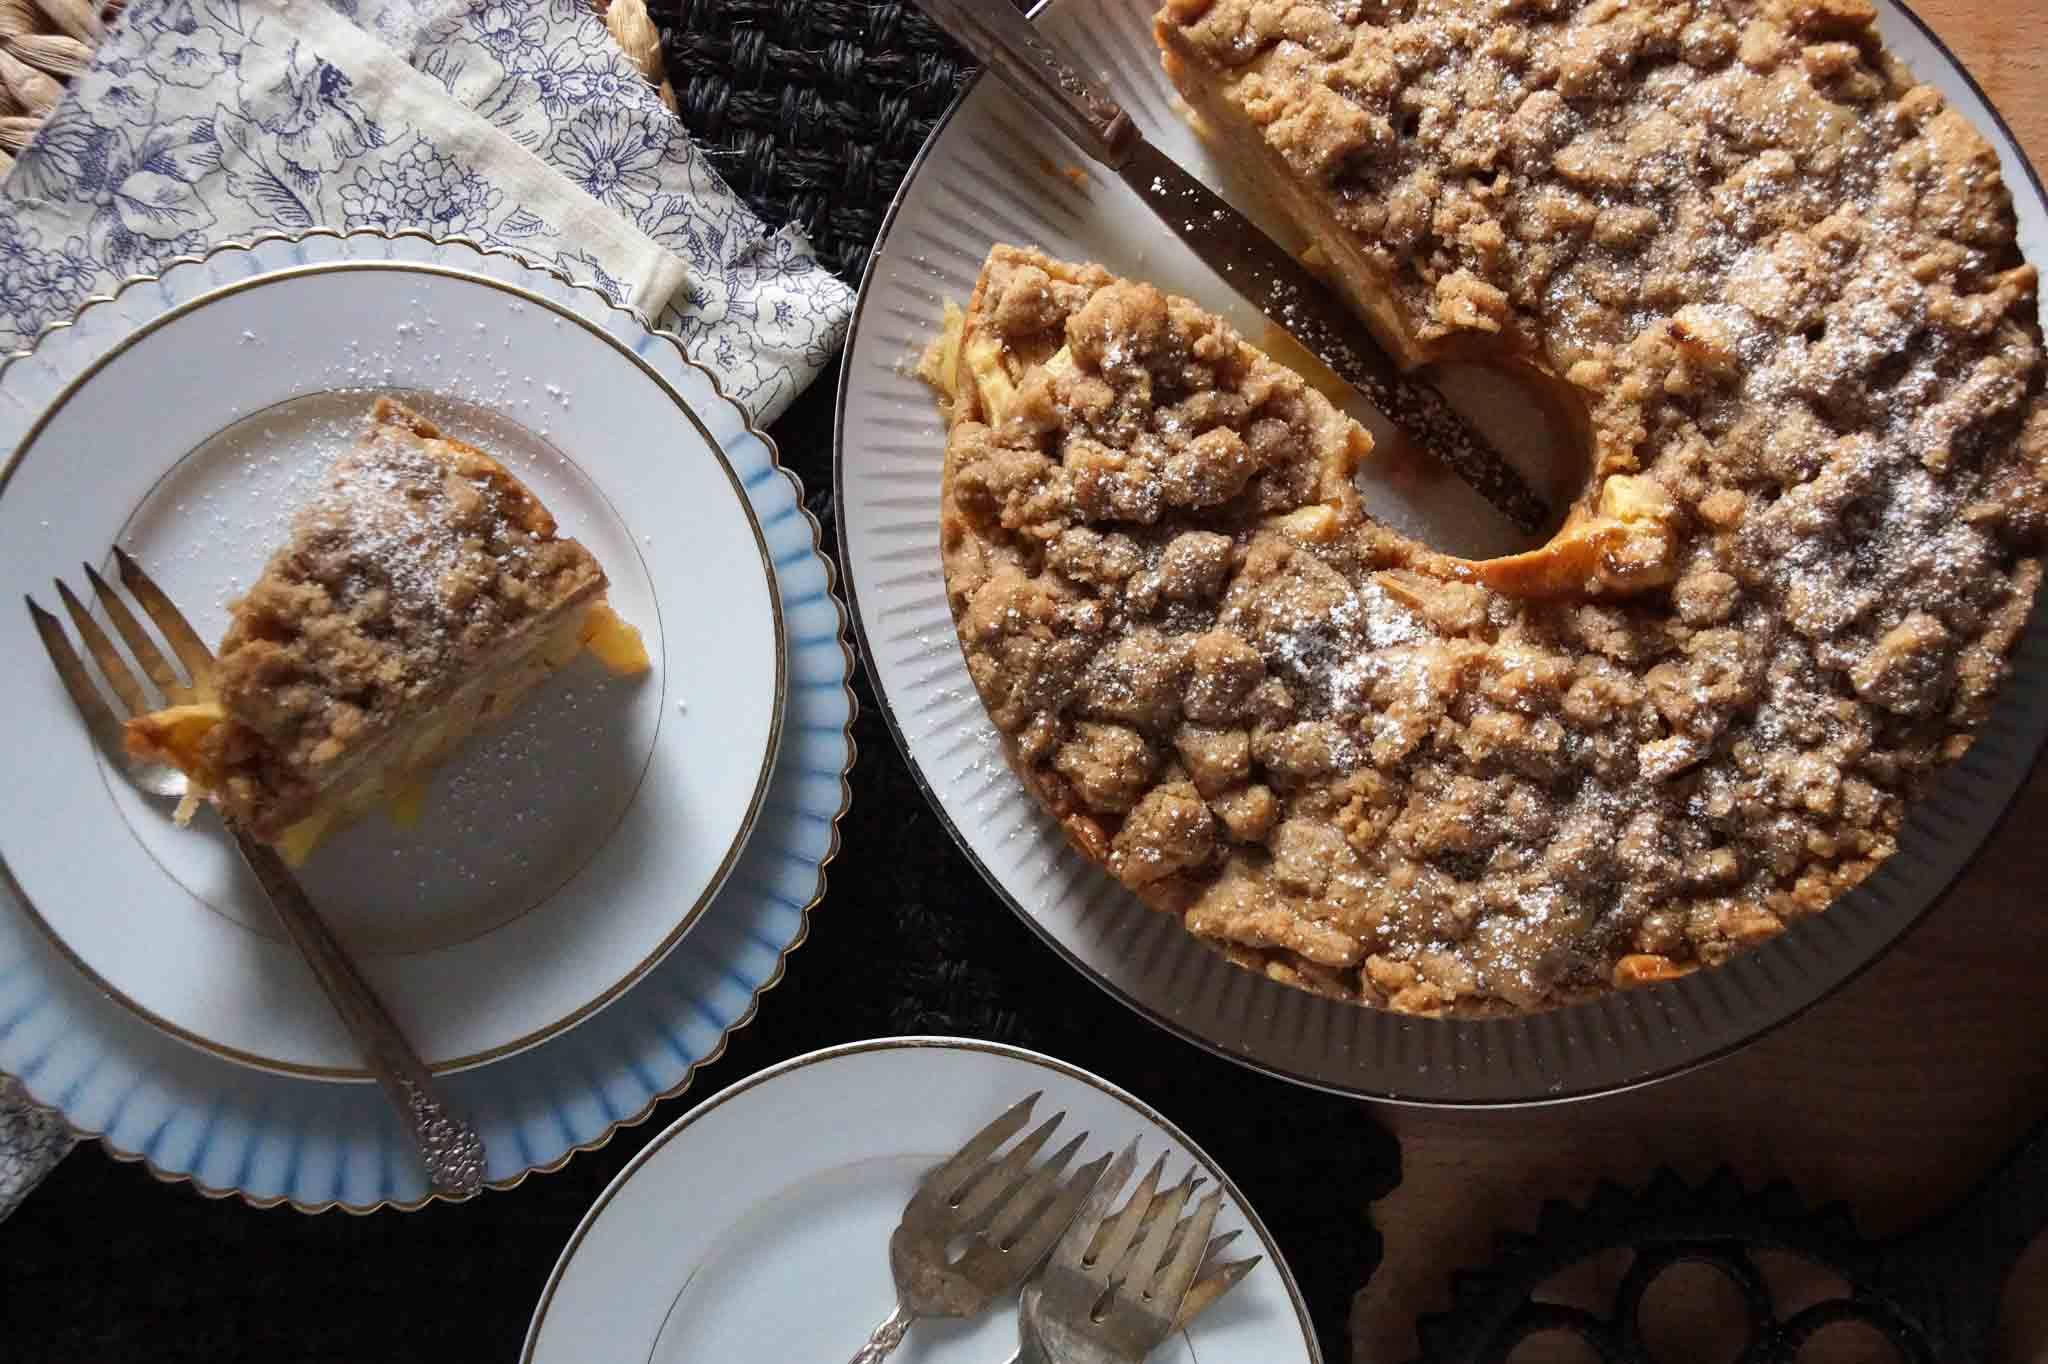 karina39s jewish apple cake recipe with sour cream recipes dishmaps